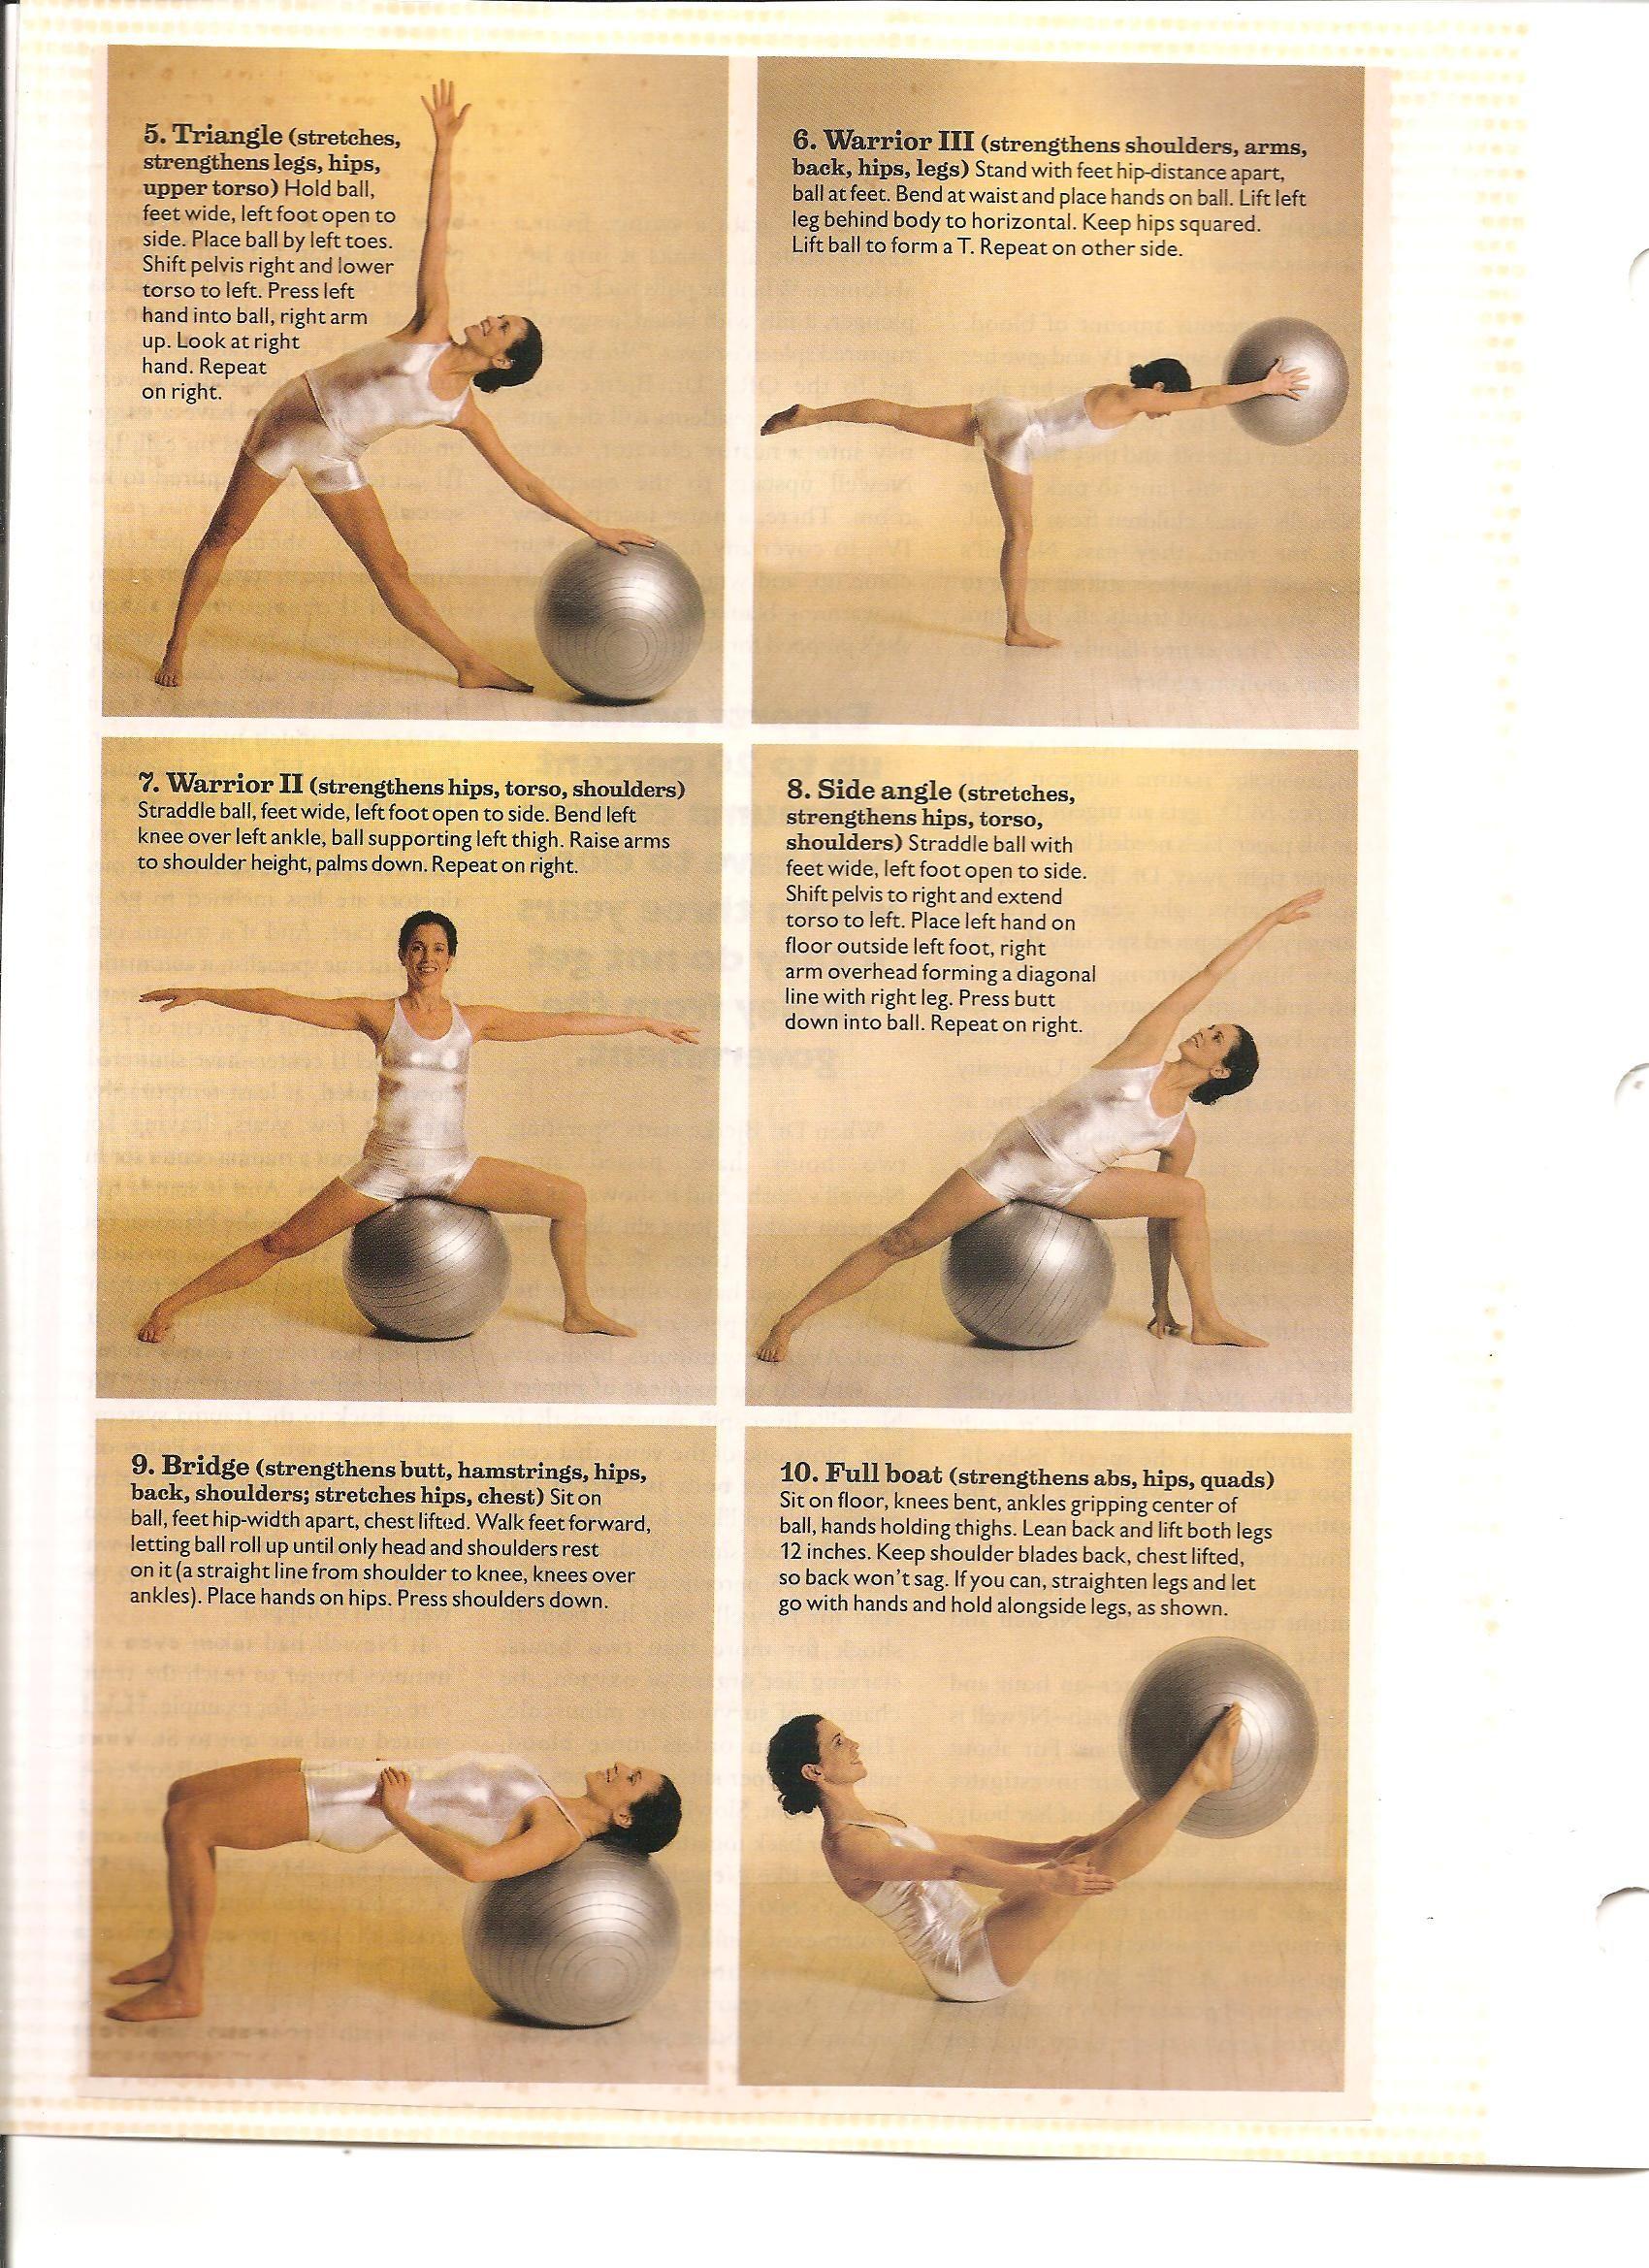 Stability ball Yoga part 2 Ejercicios Con Pelota c64422b6ac7e